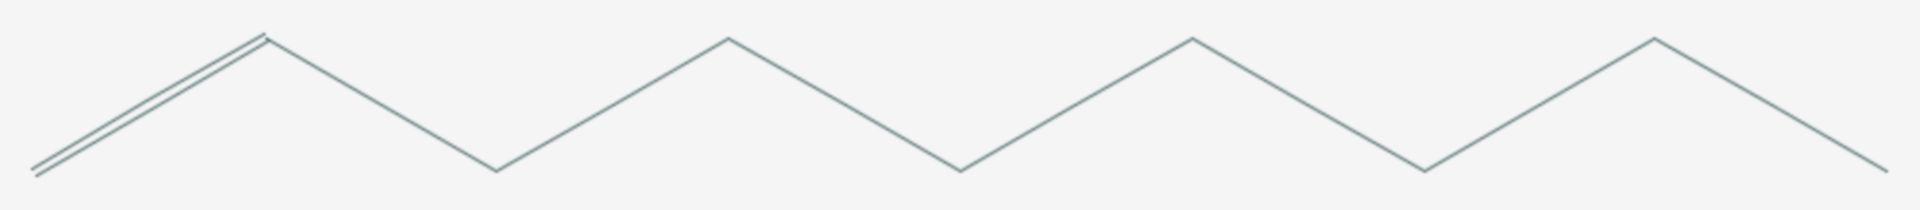 1-Nonen (Strukturformel)